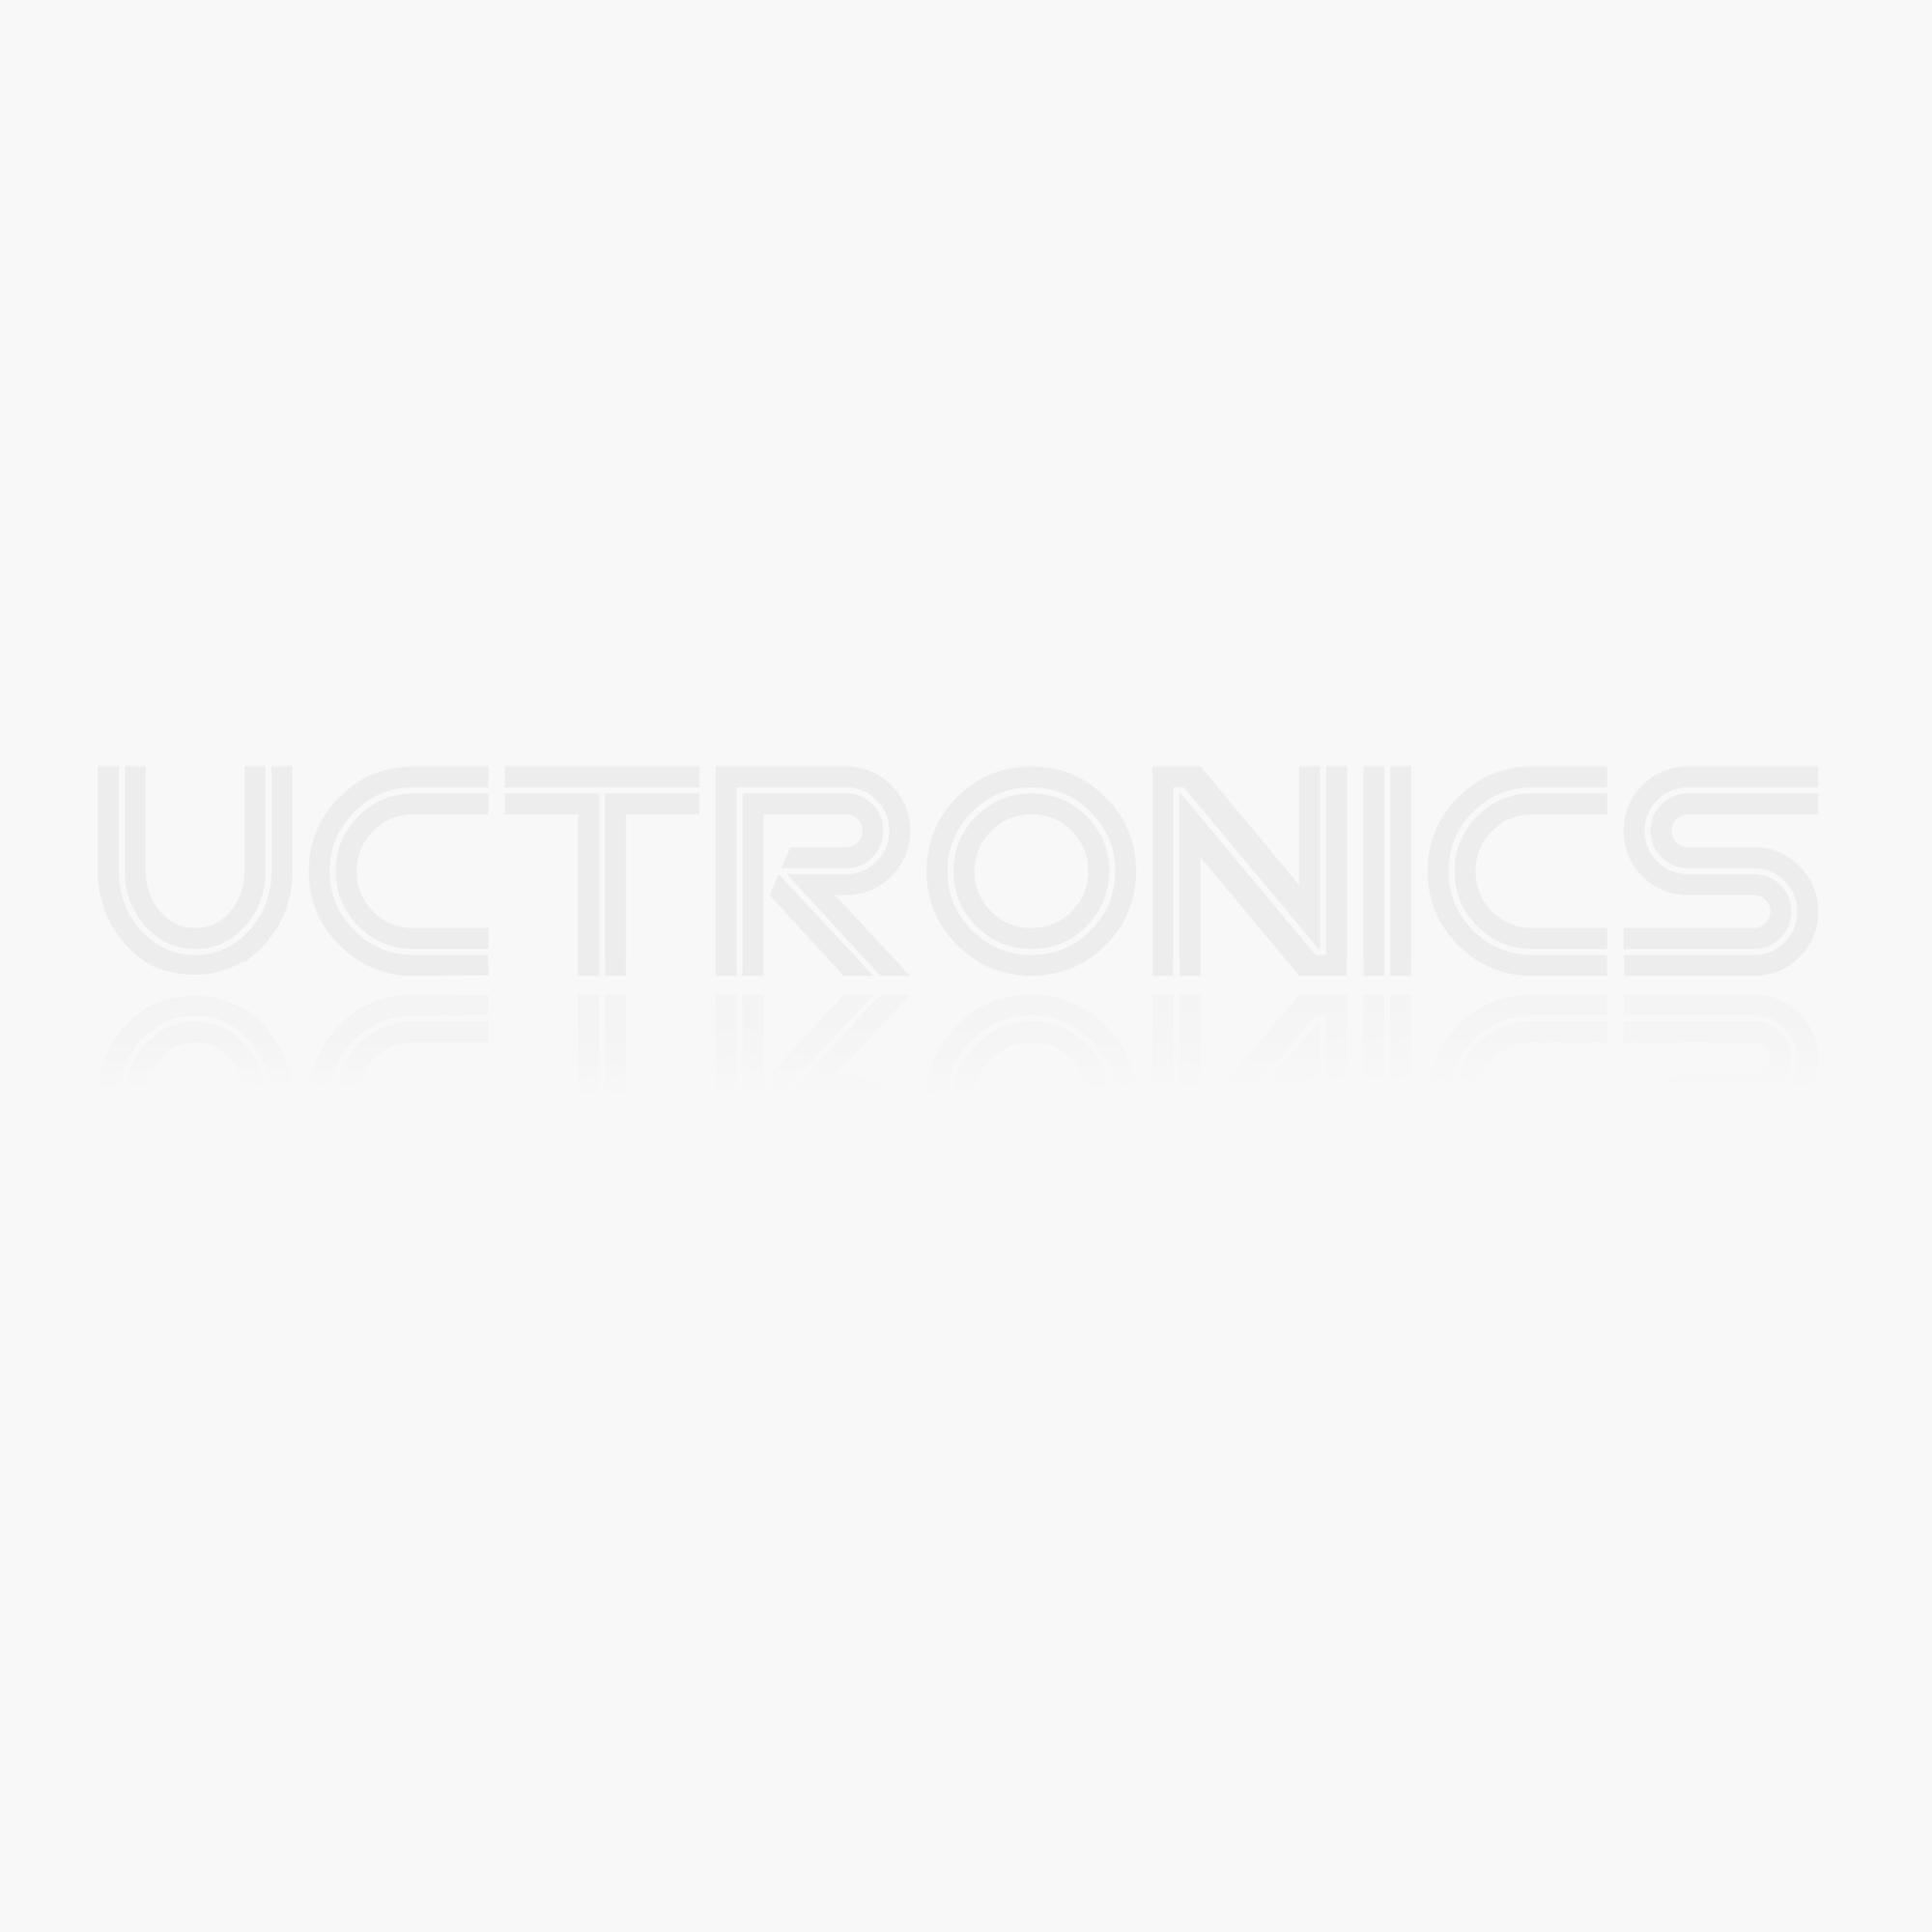 Ultrasonic Module HC-SR04 Distance Measuring Transducer